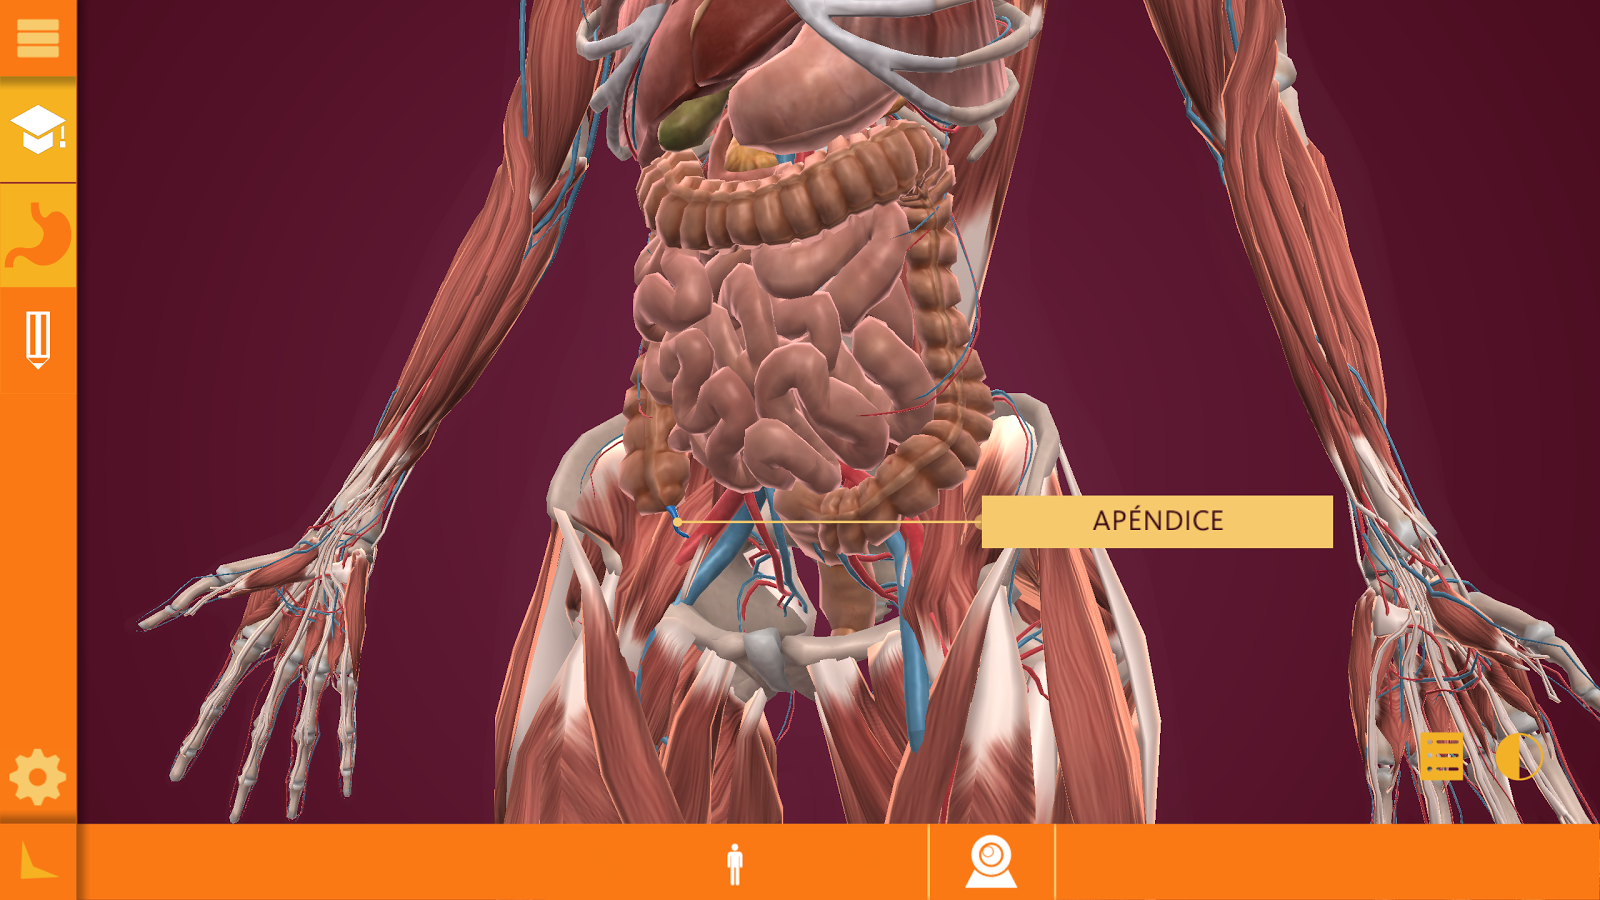 Arloon Anatomy #app #android | ra | Pinterest